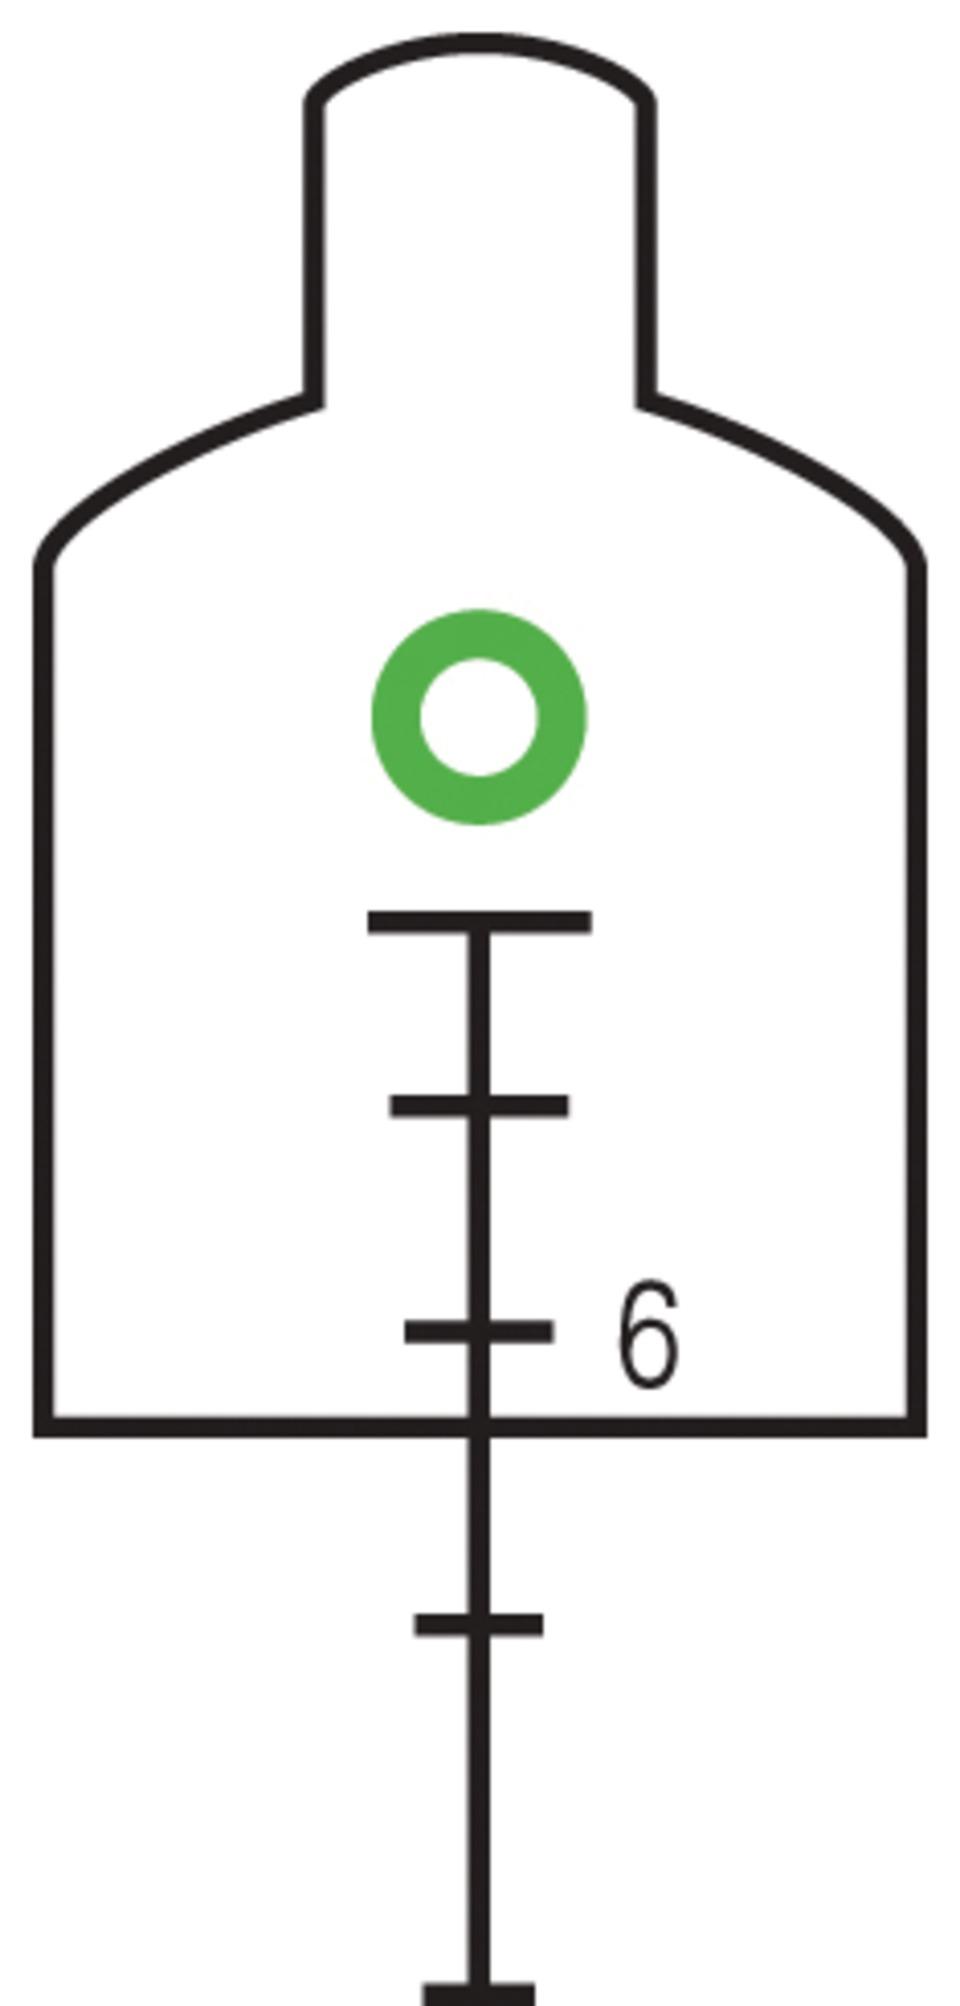 Trijicon Inc. ACOG Scope variation in Firearm Accessories